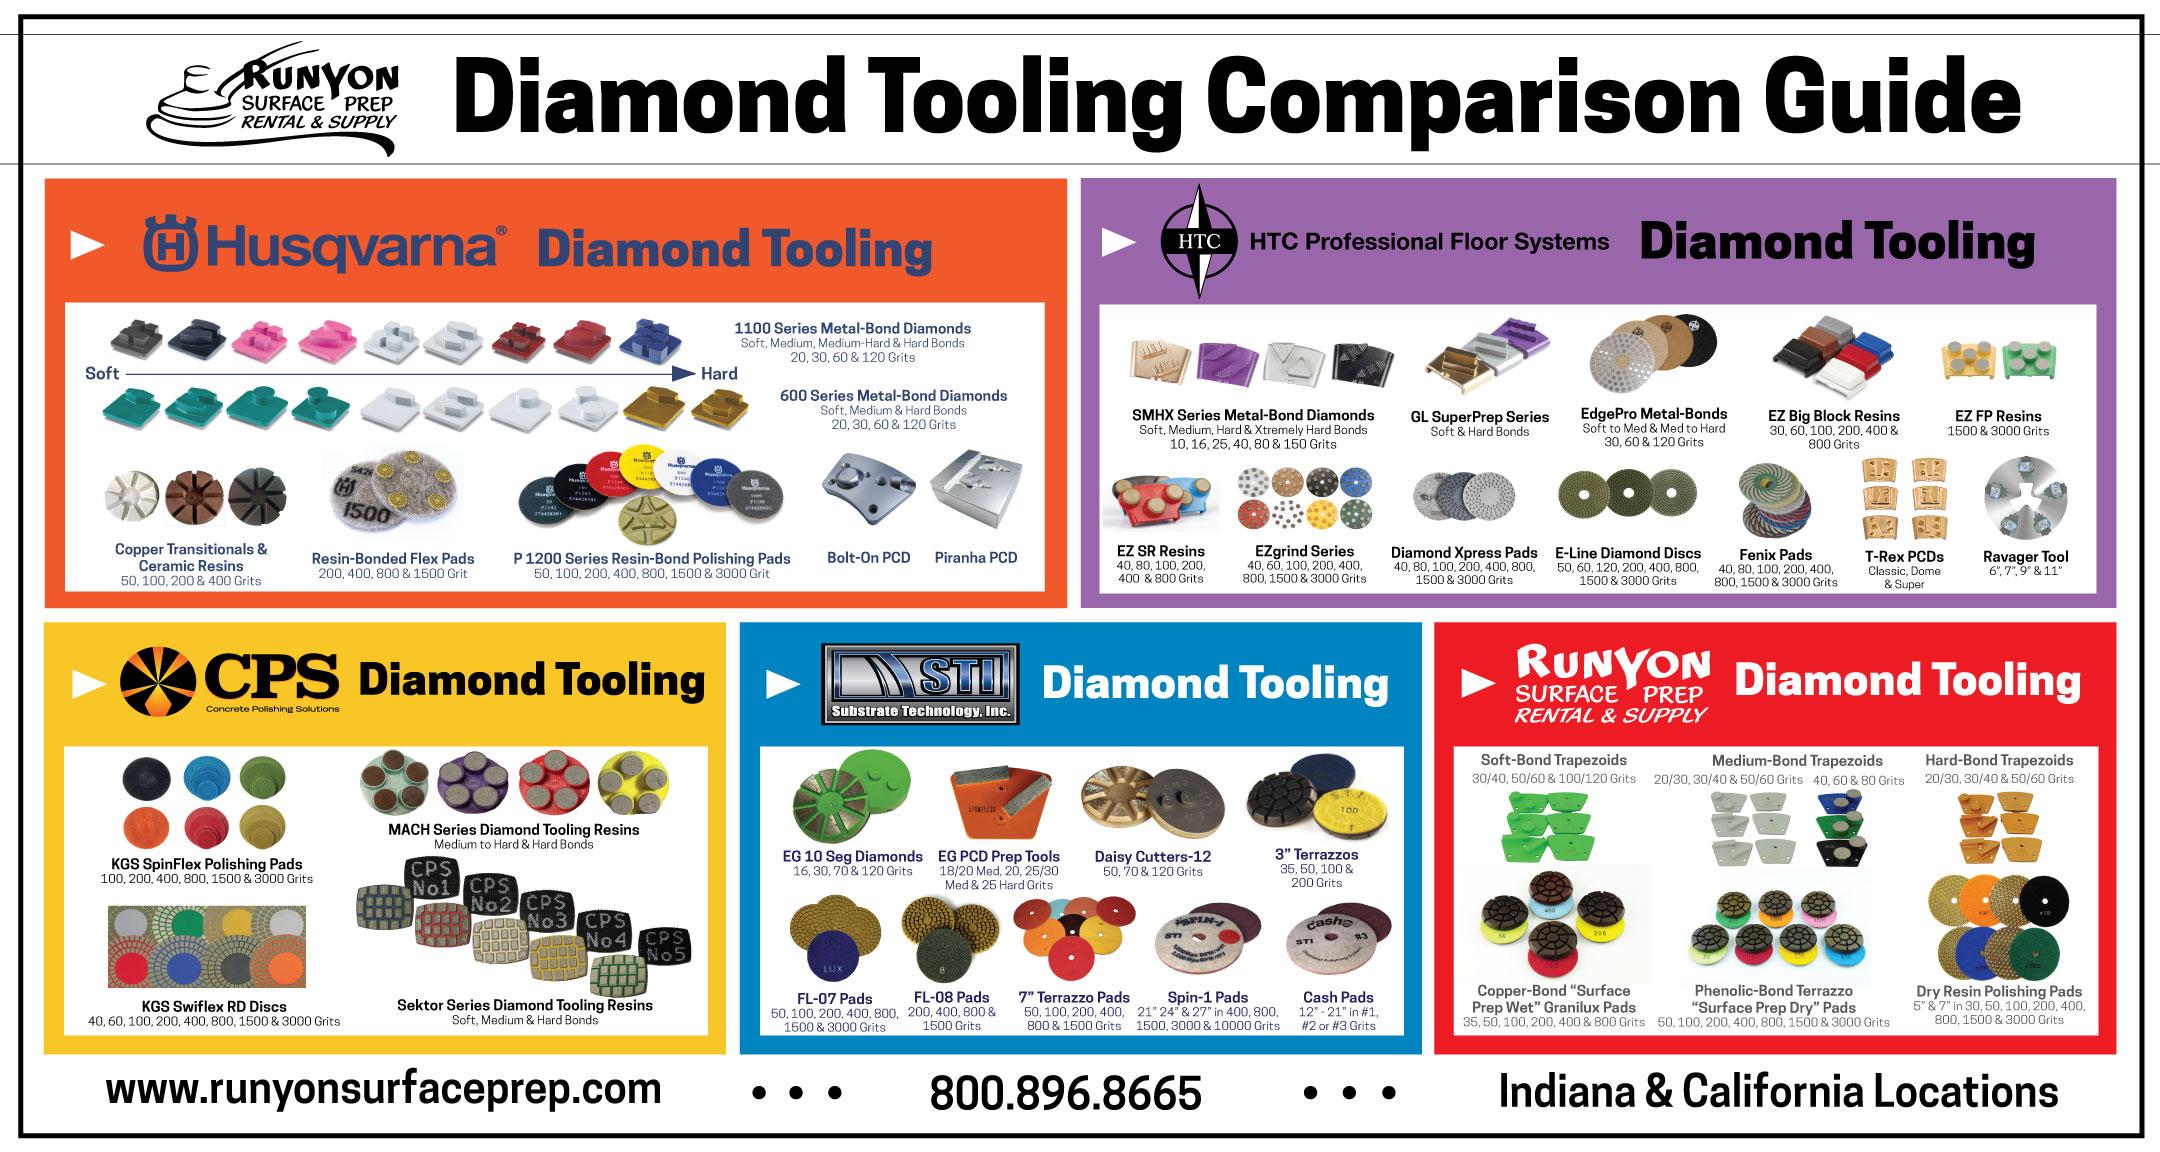 Runyon Diamond Tooling Comparison Guide